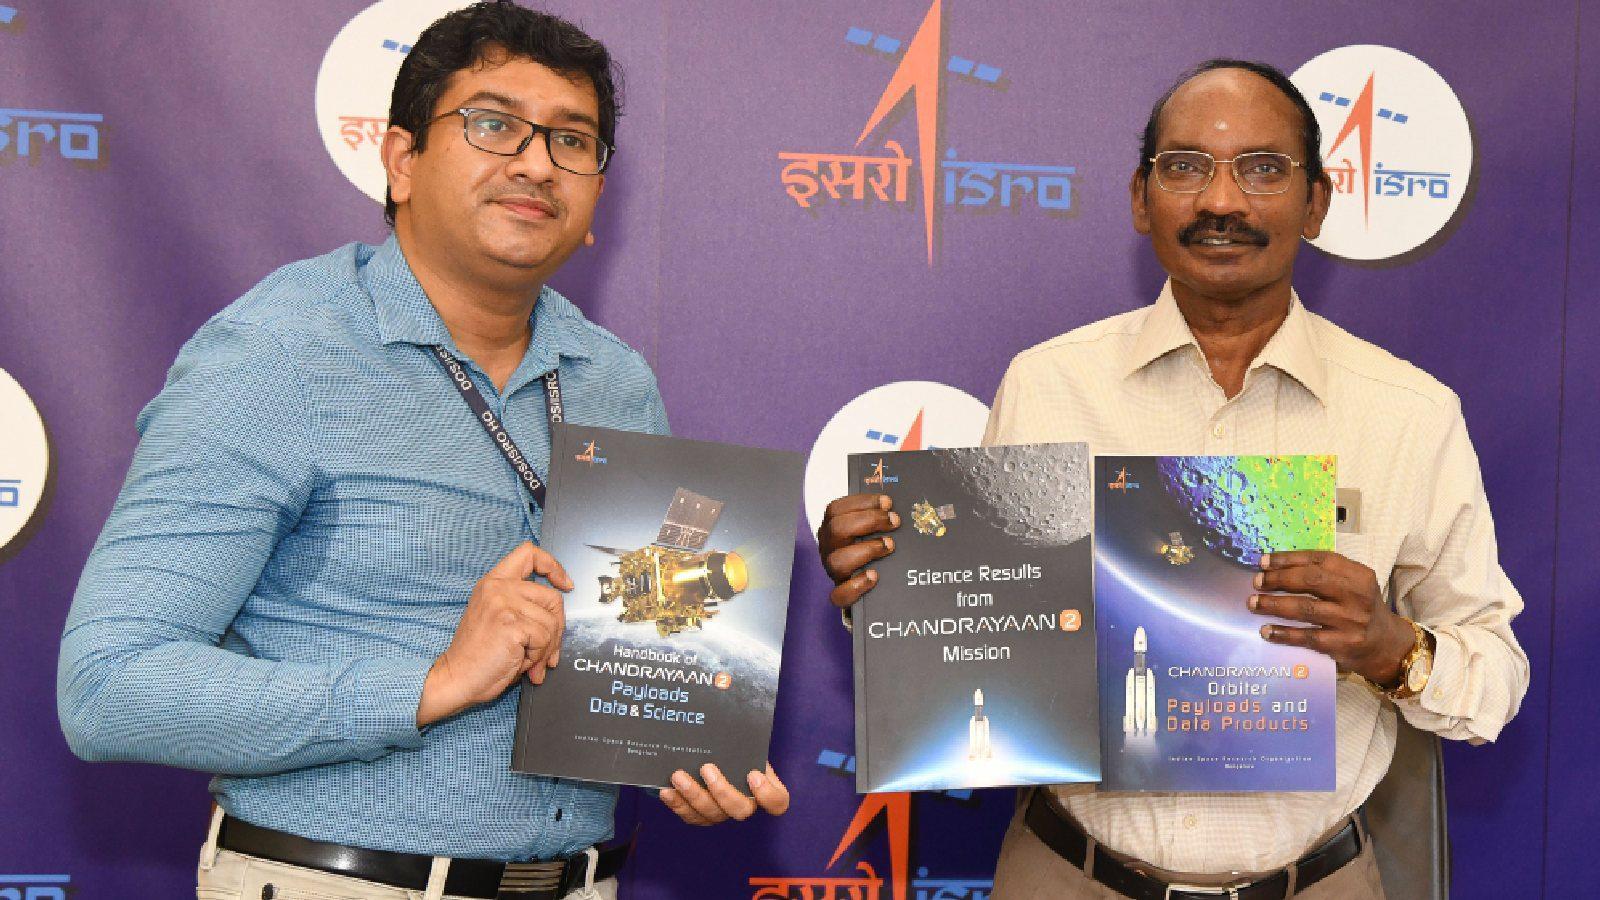 ISRO Project